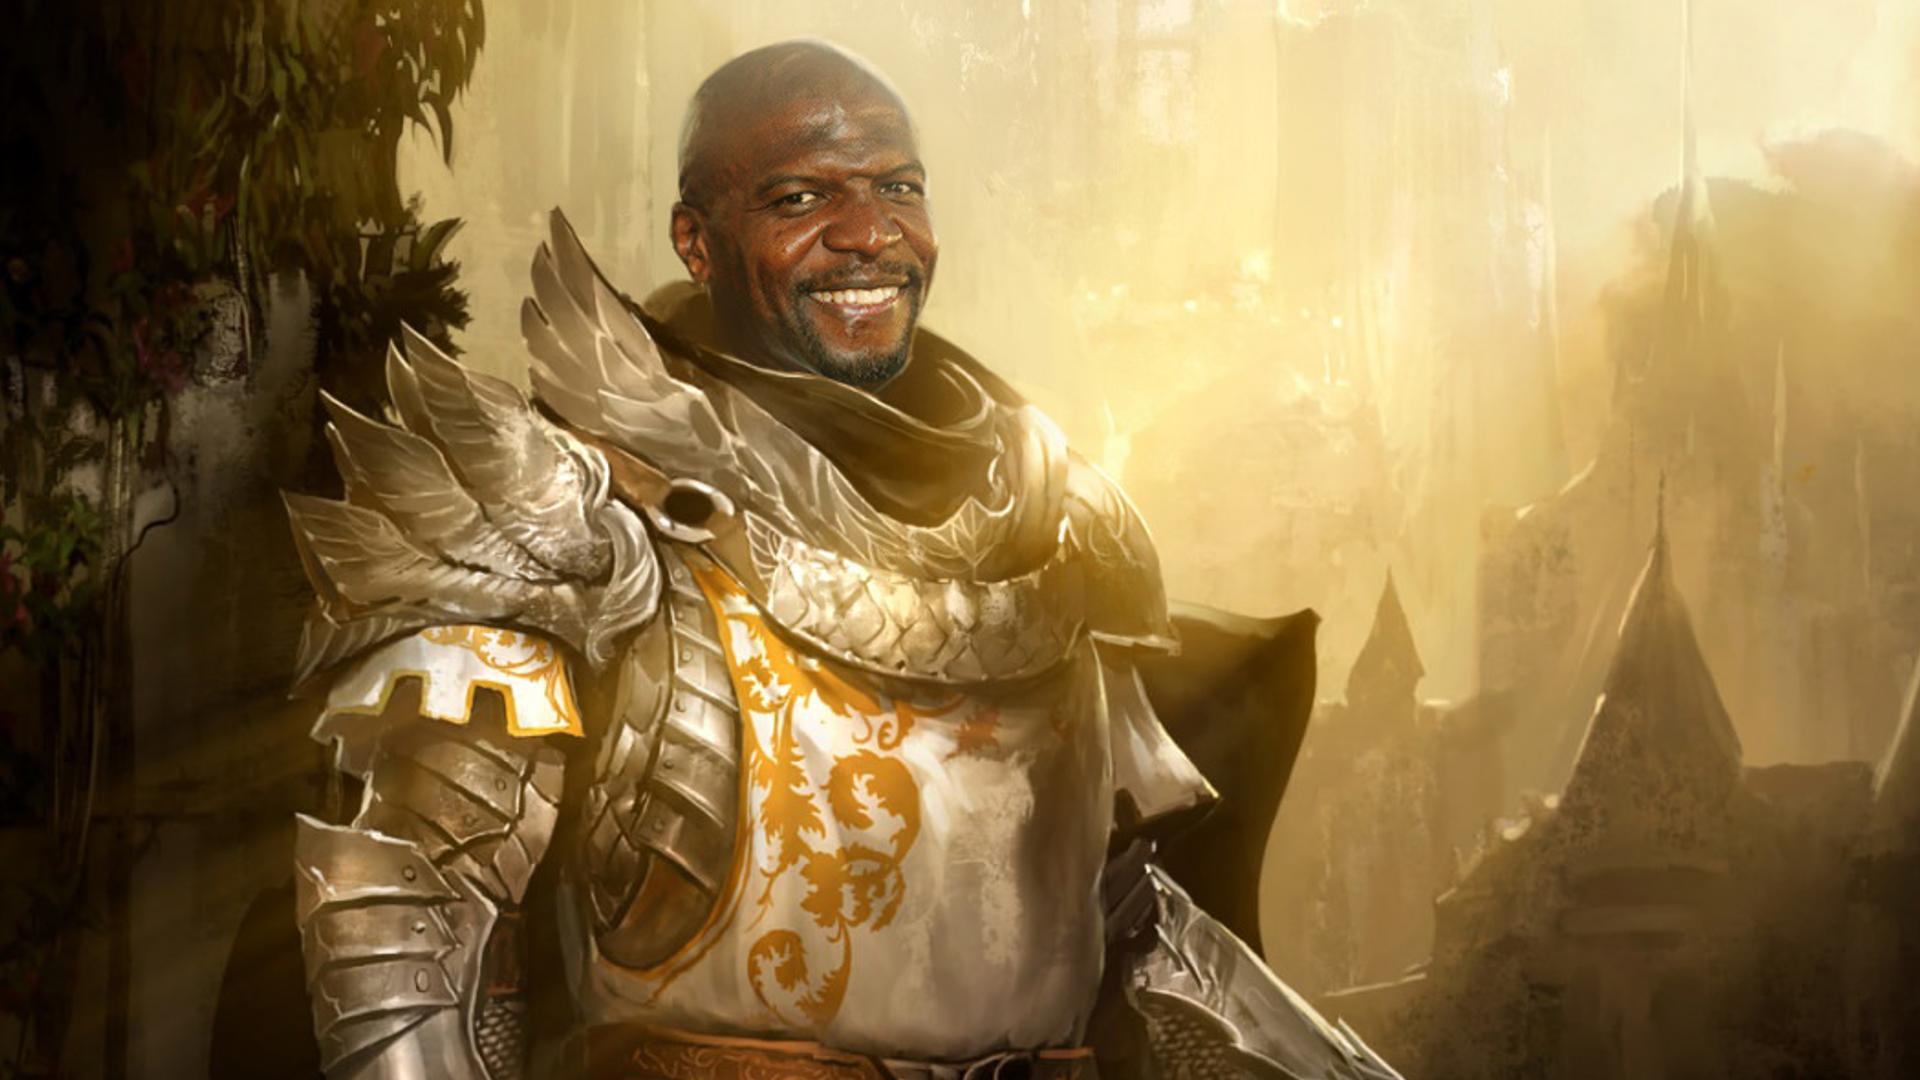 Terry Crews Portrait - Pathfinder: Kingmaker Mods | GameWatcher